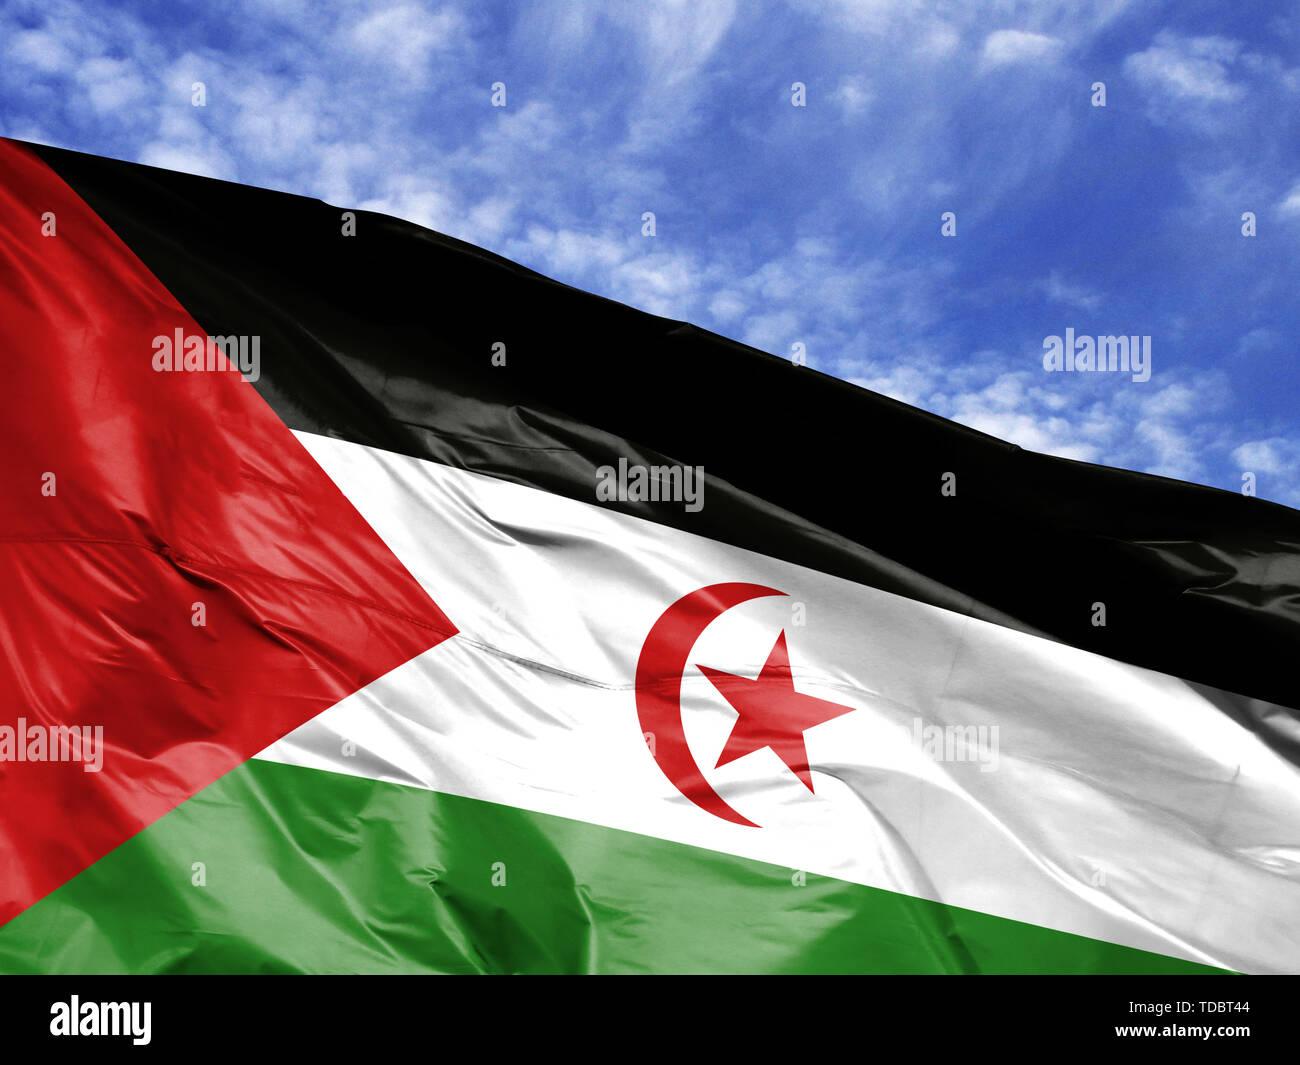 waving flag of Western Sahara close up against blue sky - Stock Image